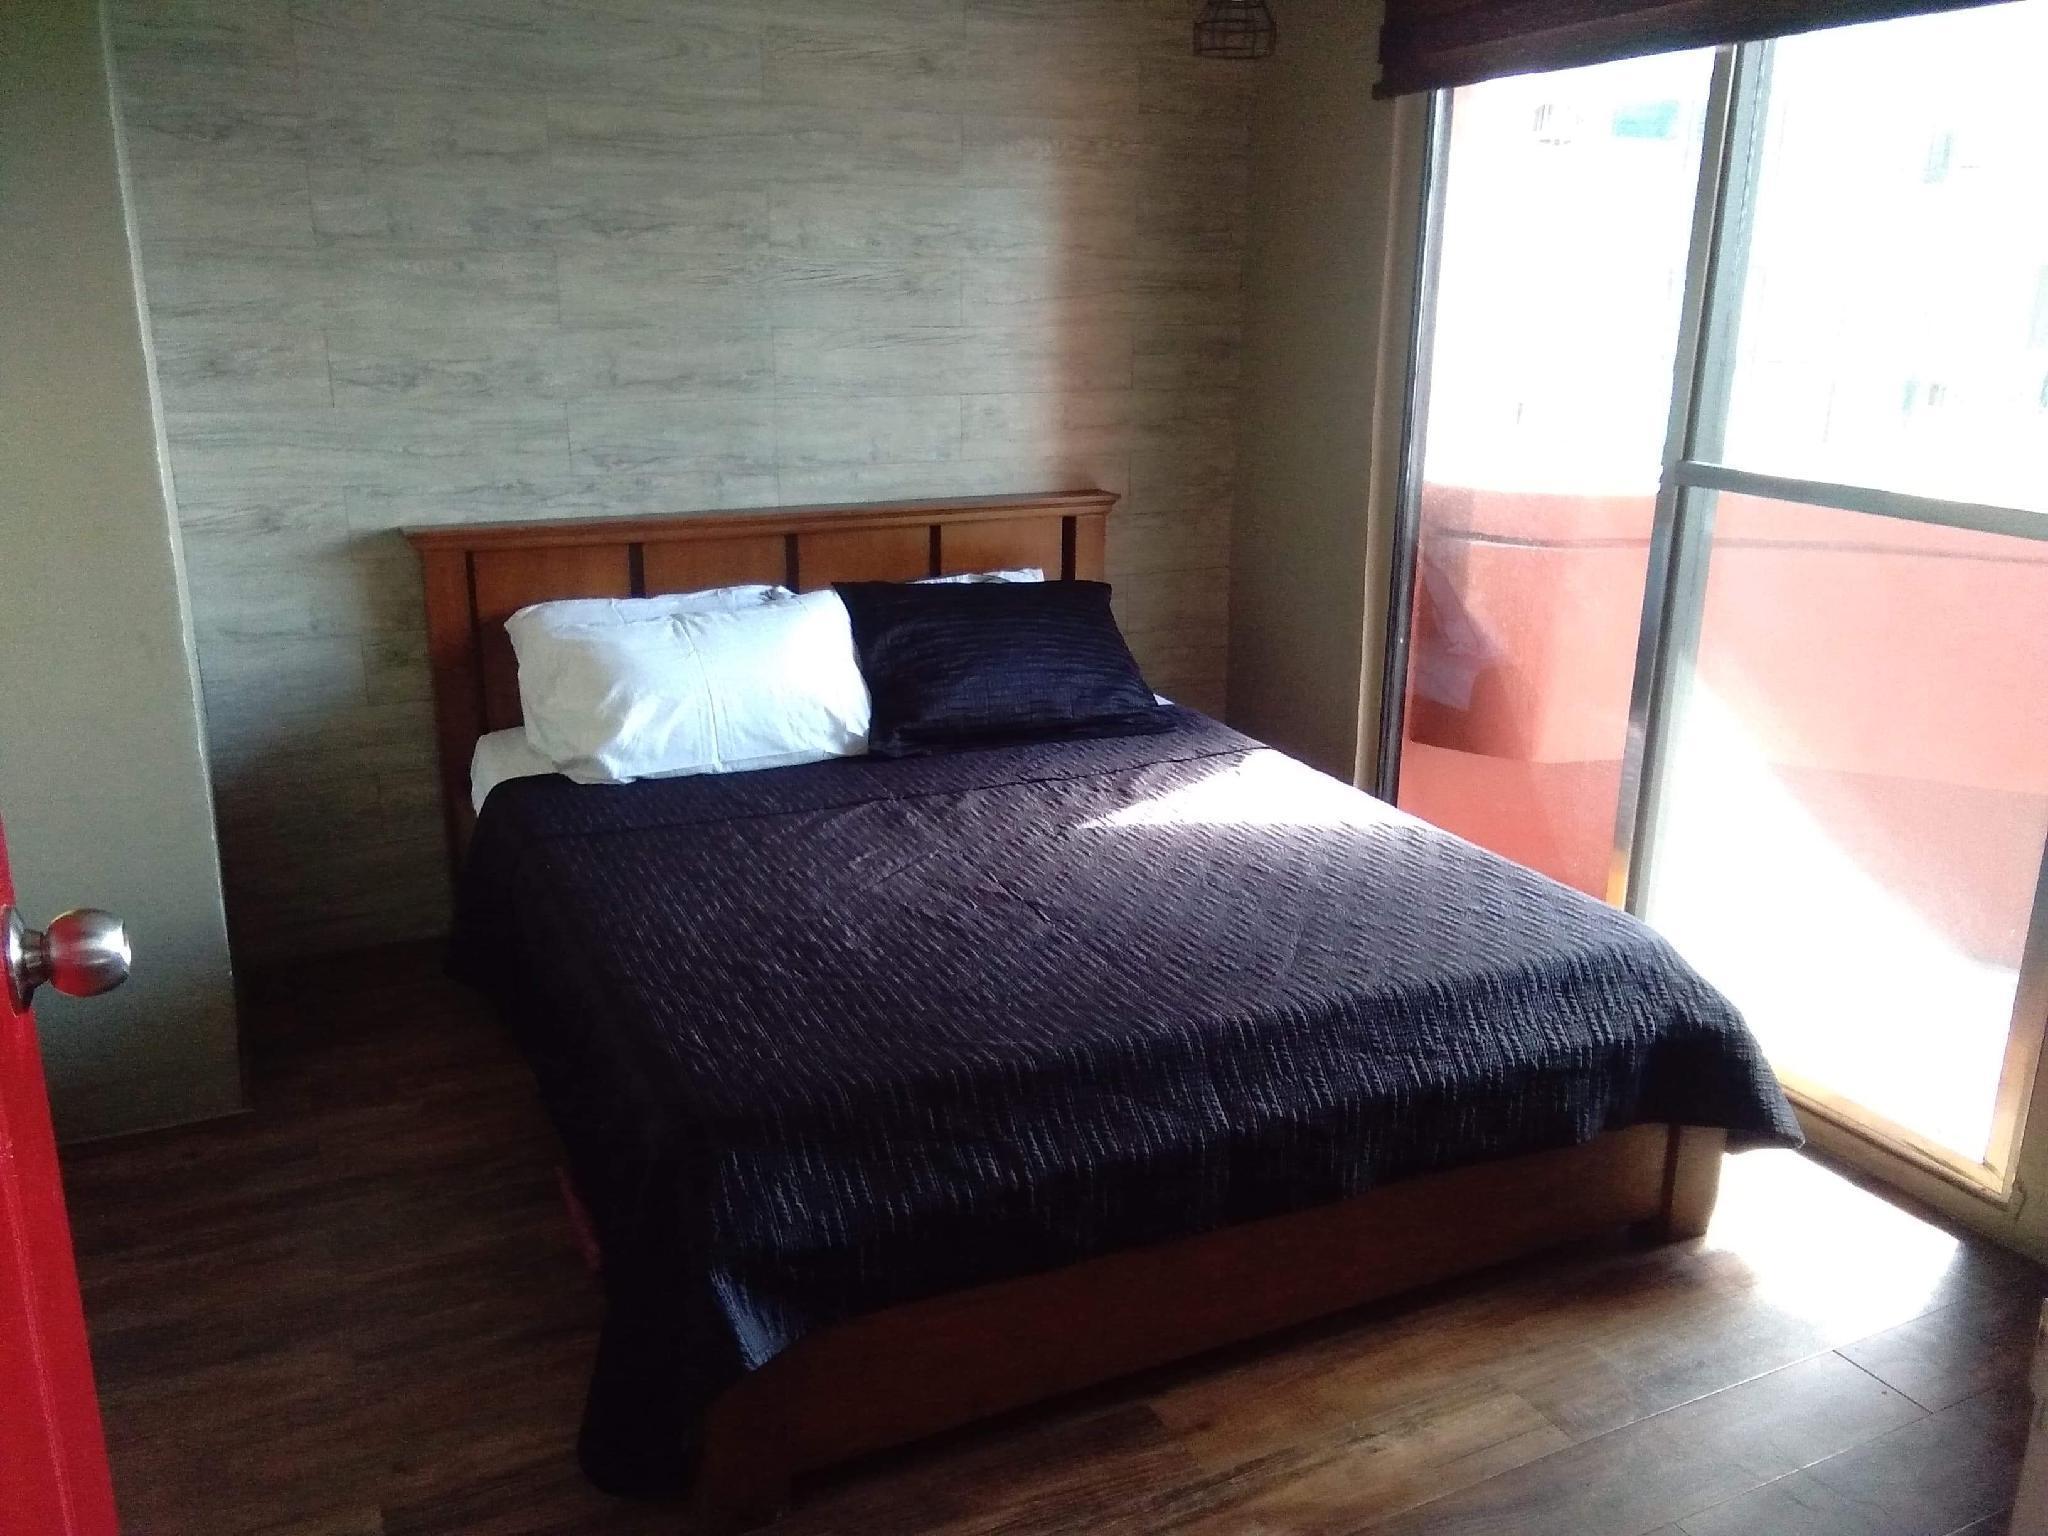 Poblacion Renovated Flat Sleeps 4